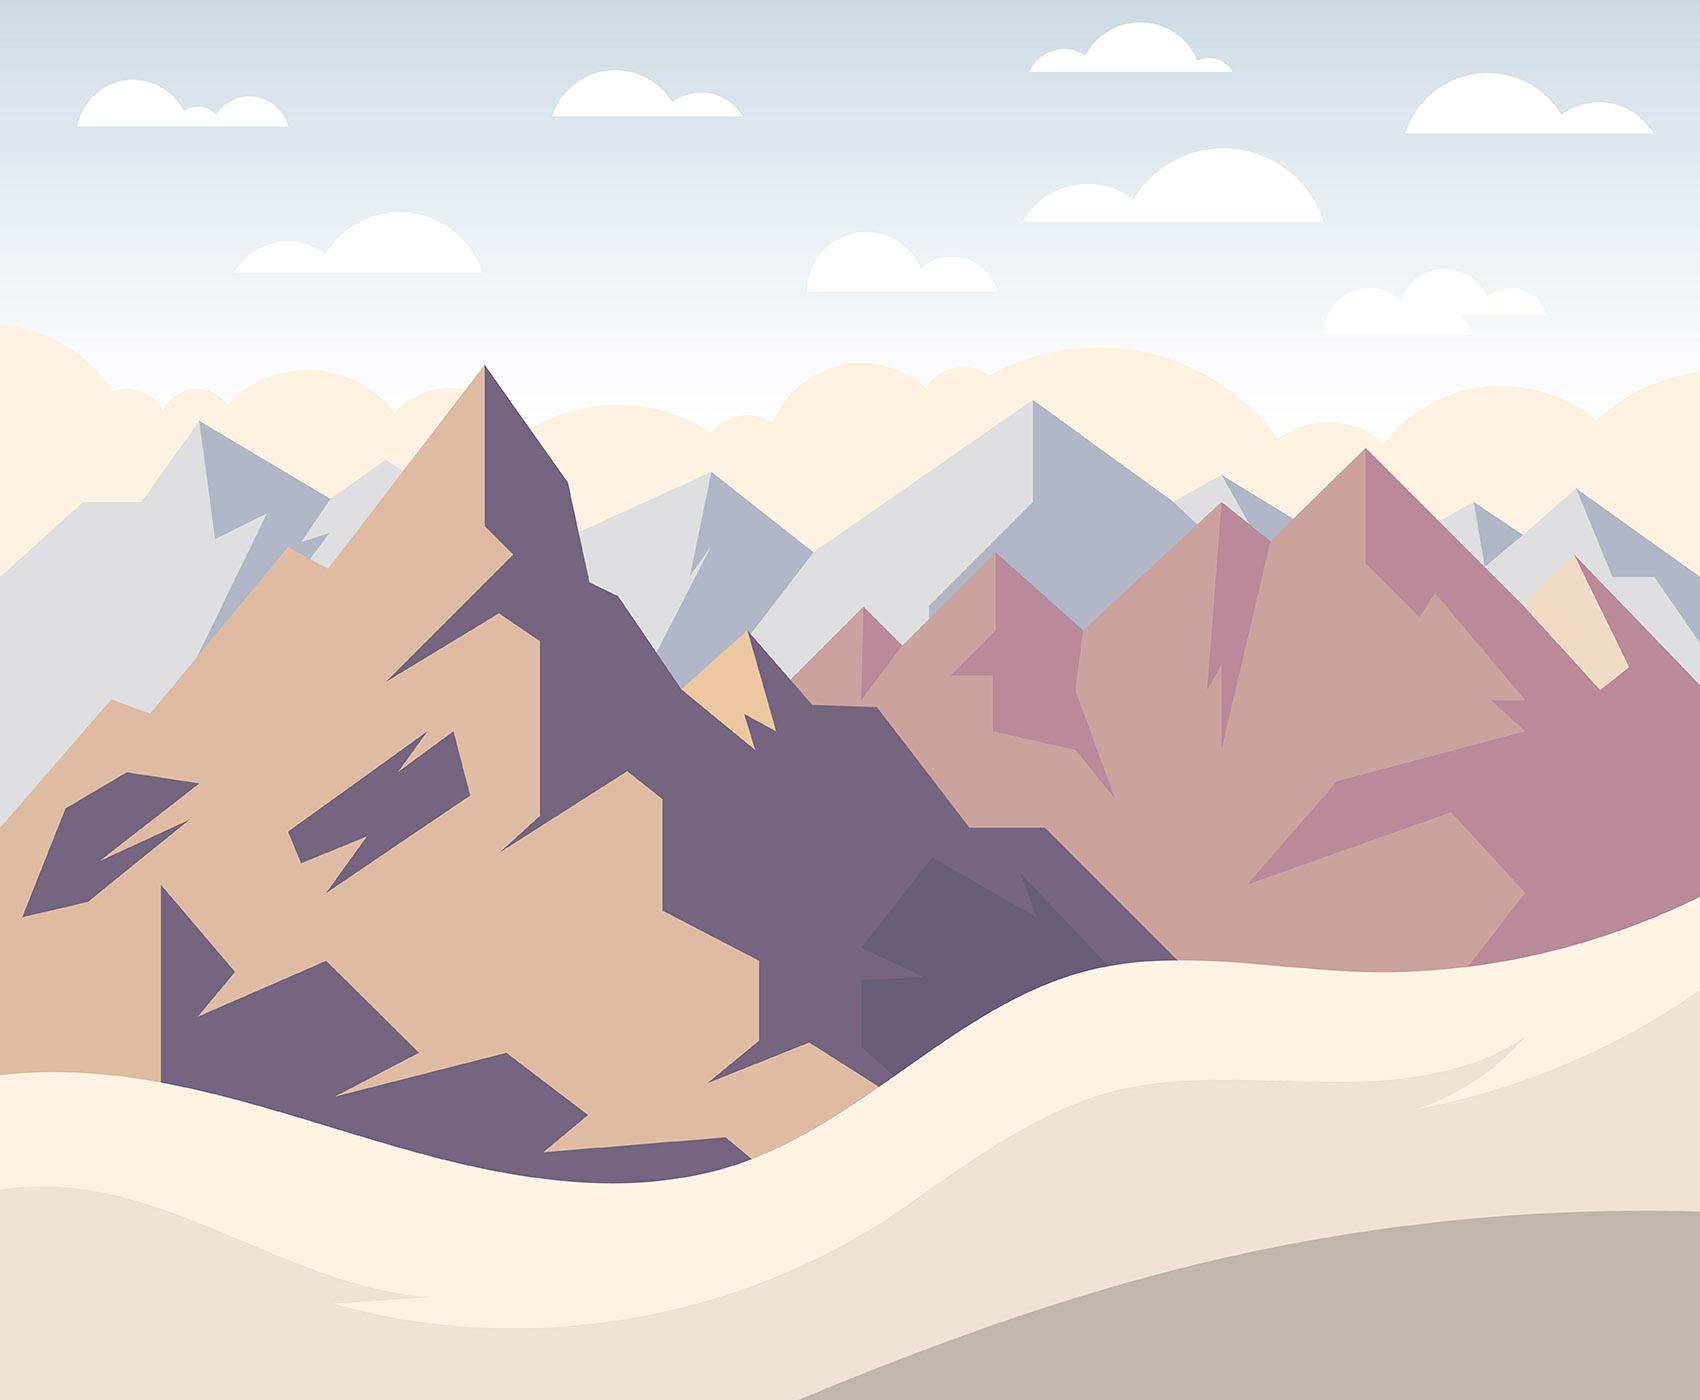 Landscape Illustration Vector Free: Mountain Landscape First Person Illustration